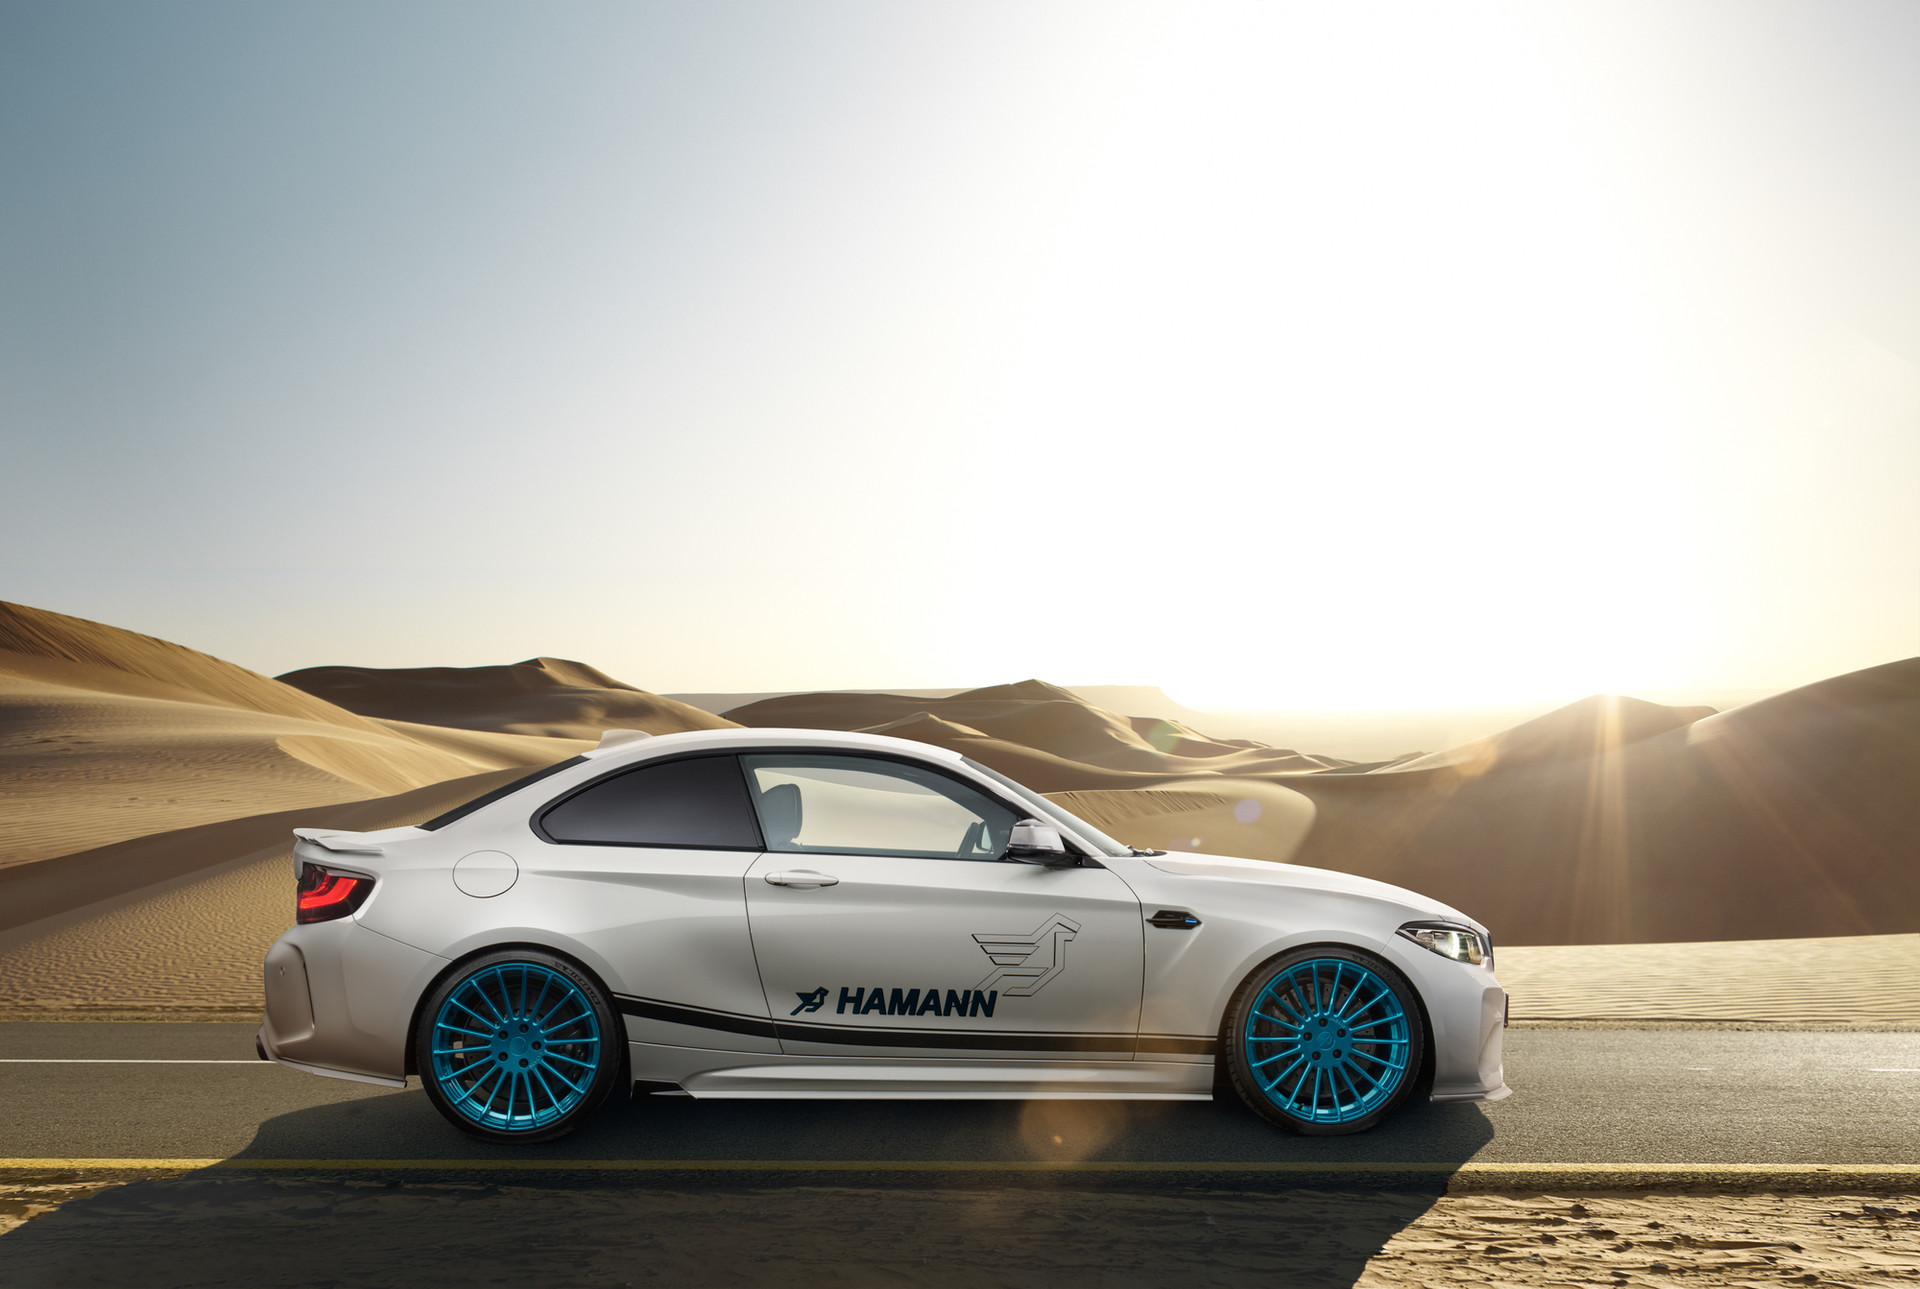 BMW_M2_02.jpg